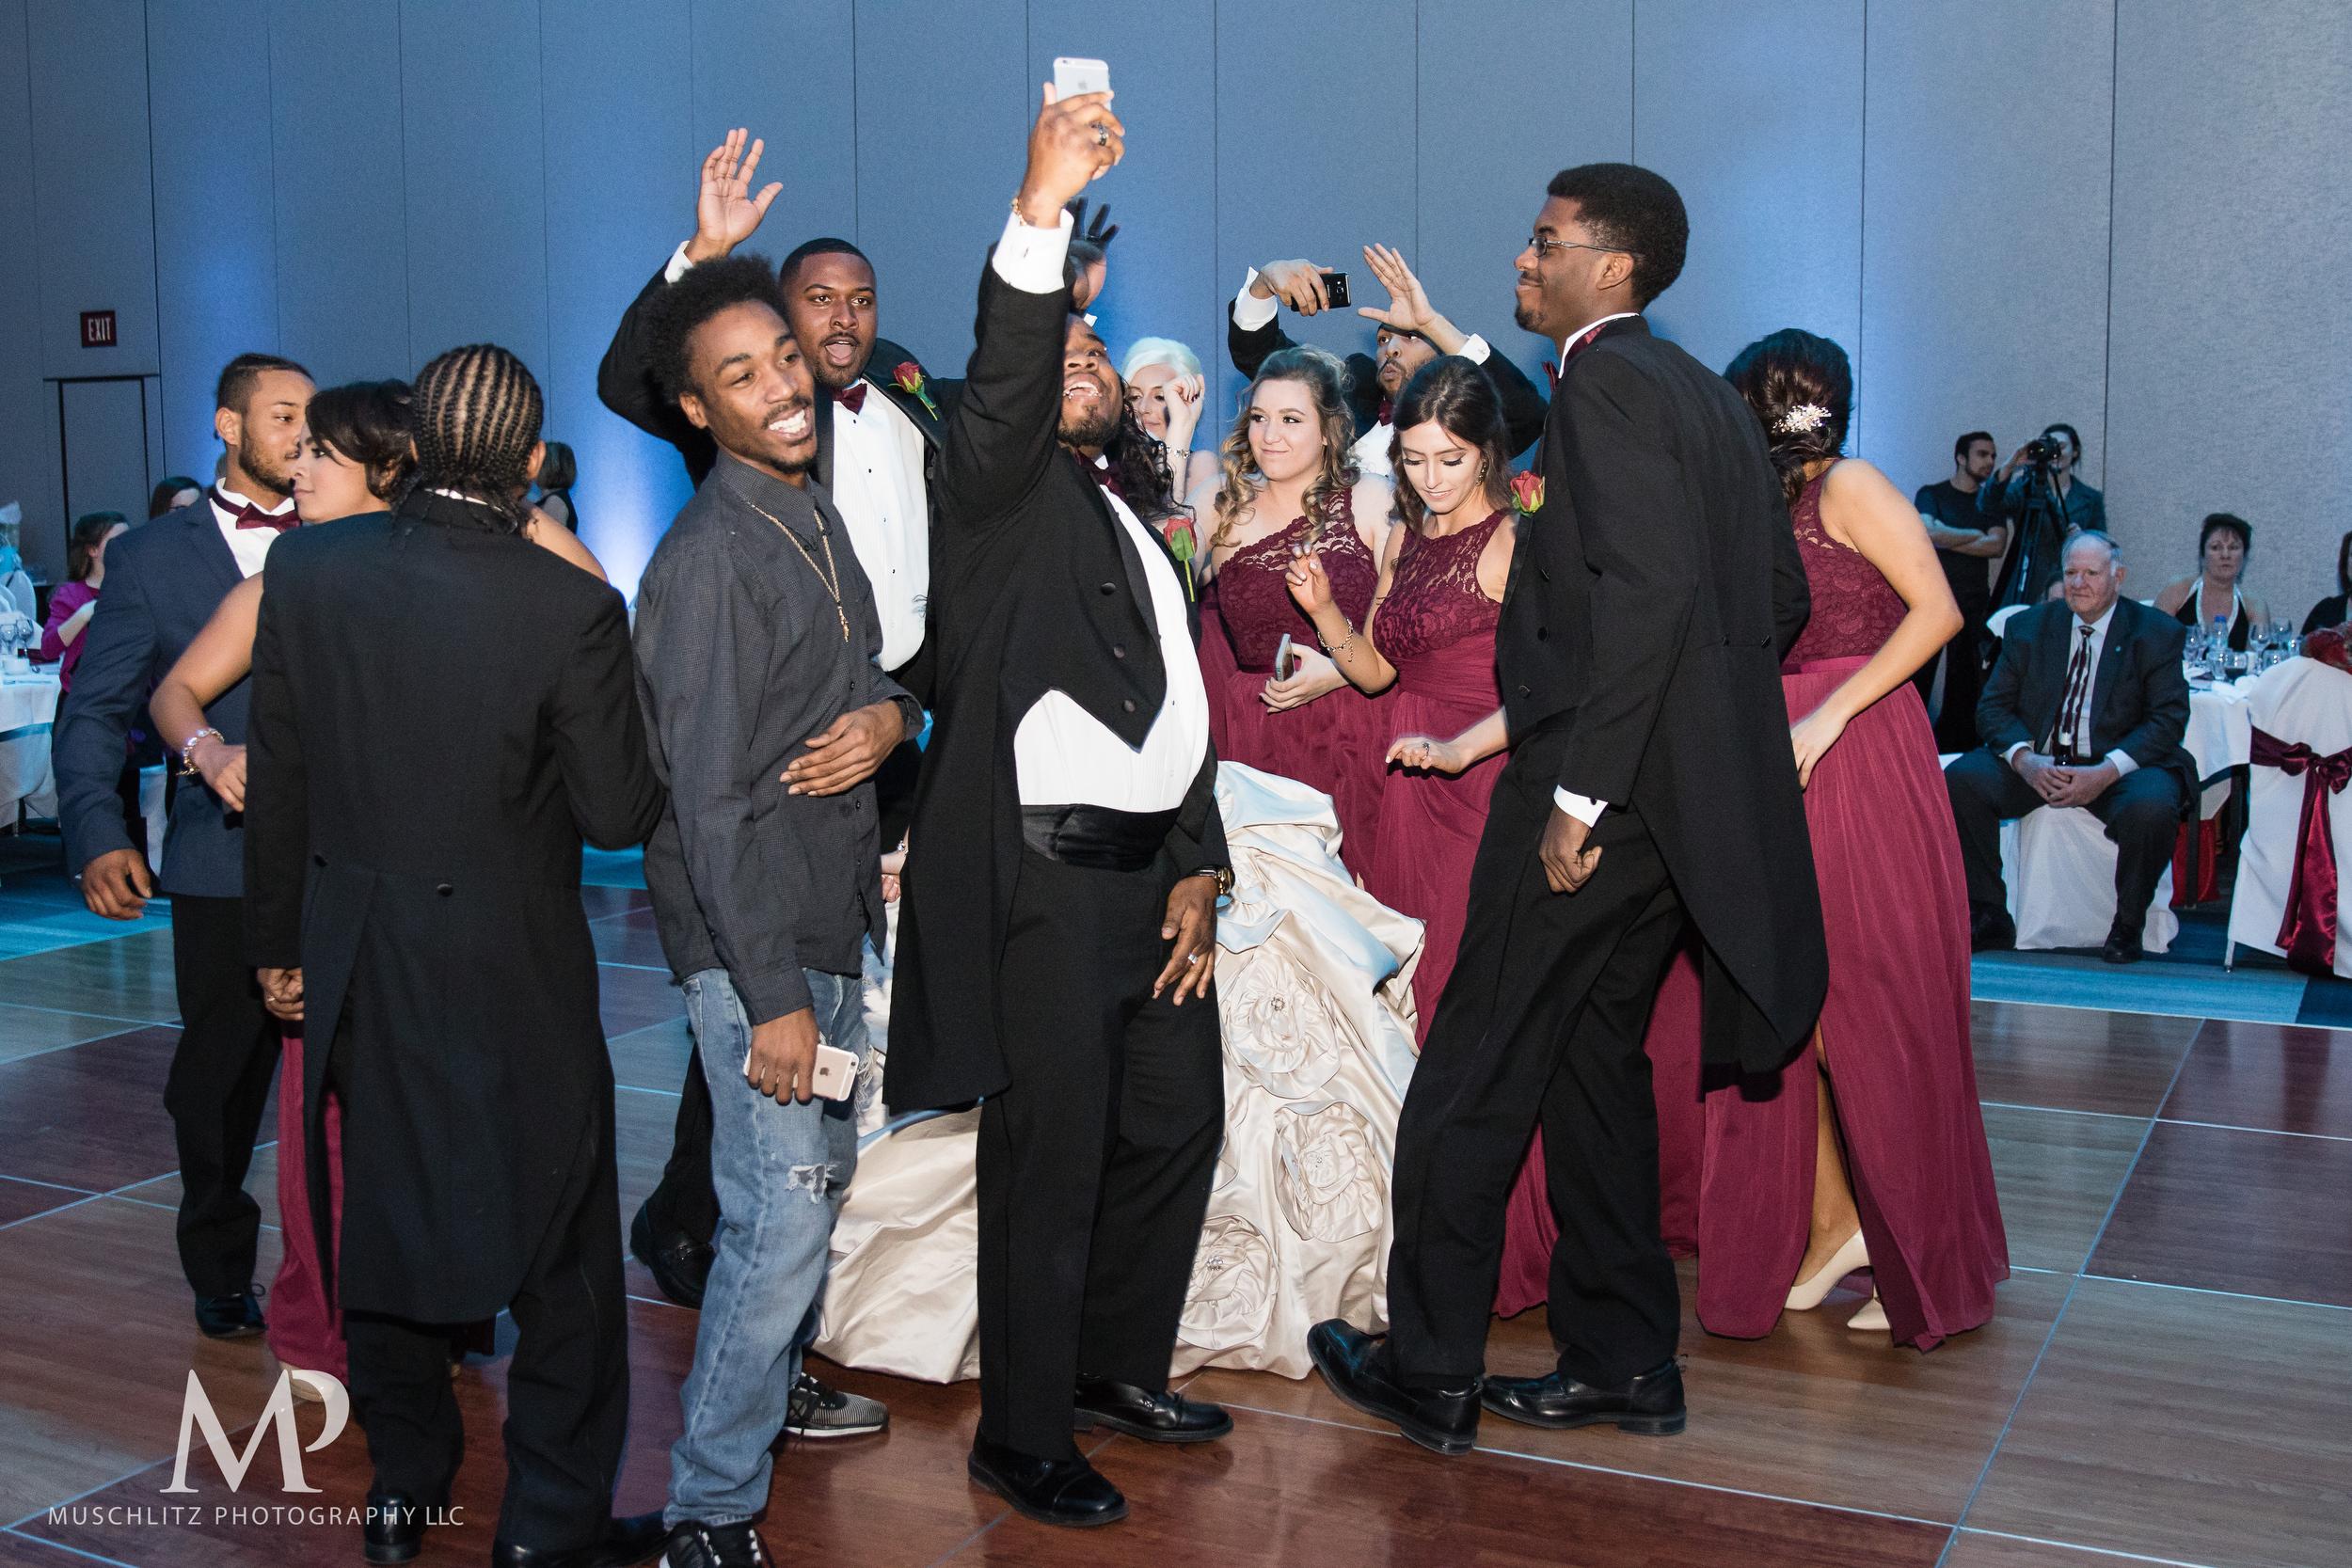 greater-columbus-convention-center-winter-wedding-ceremony-reception-portraits-columbus-ohio-muschlitz-photography-082.JPG